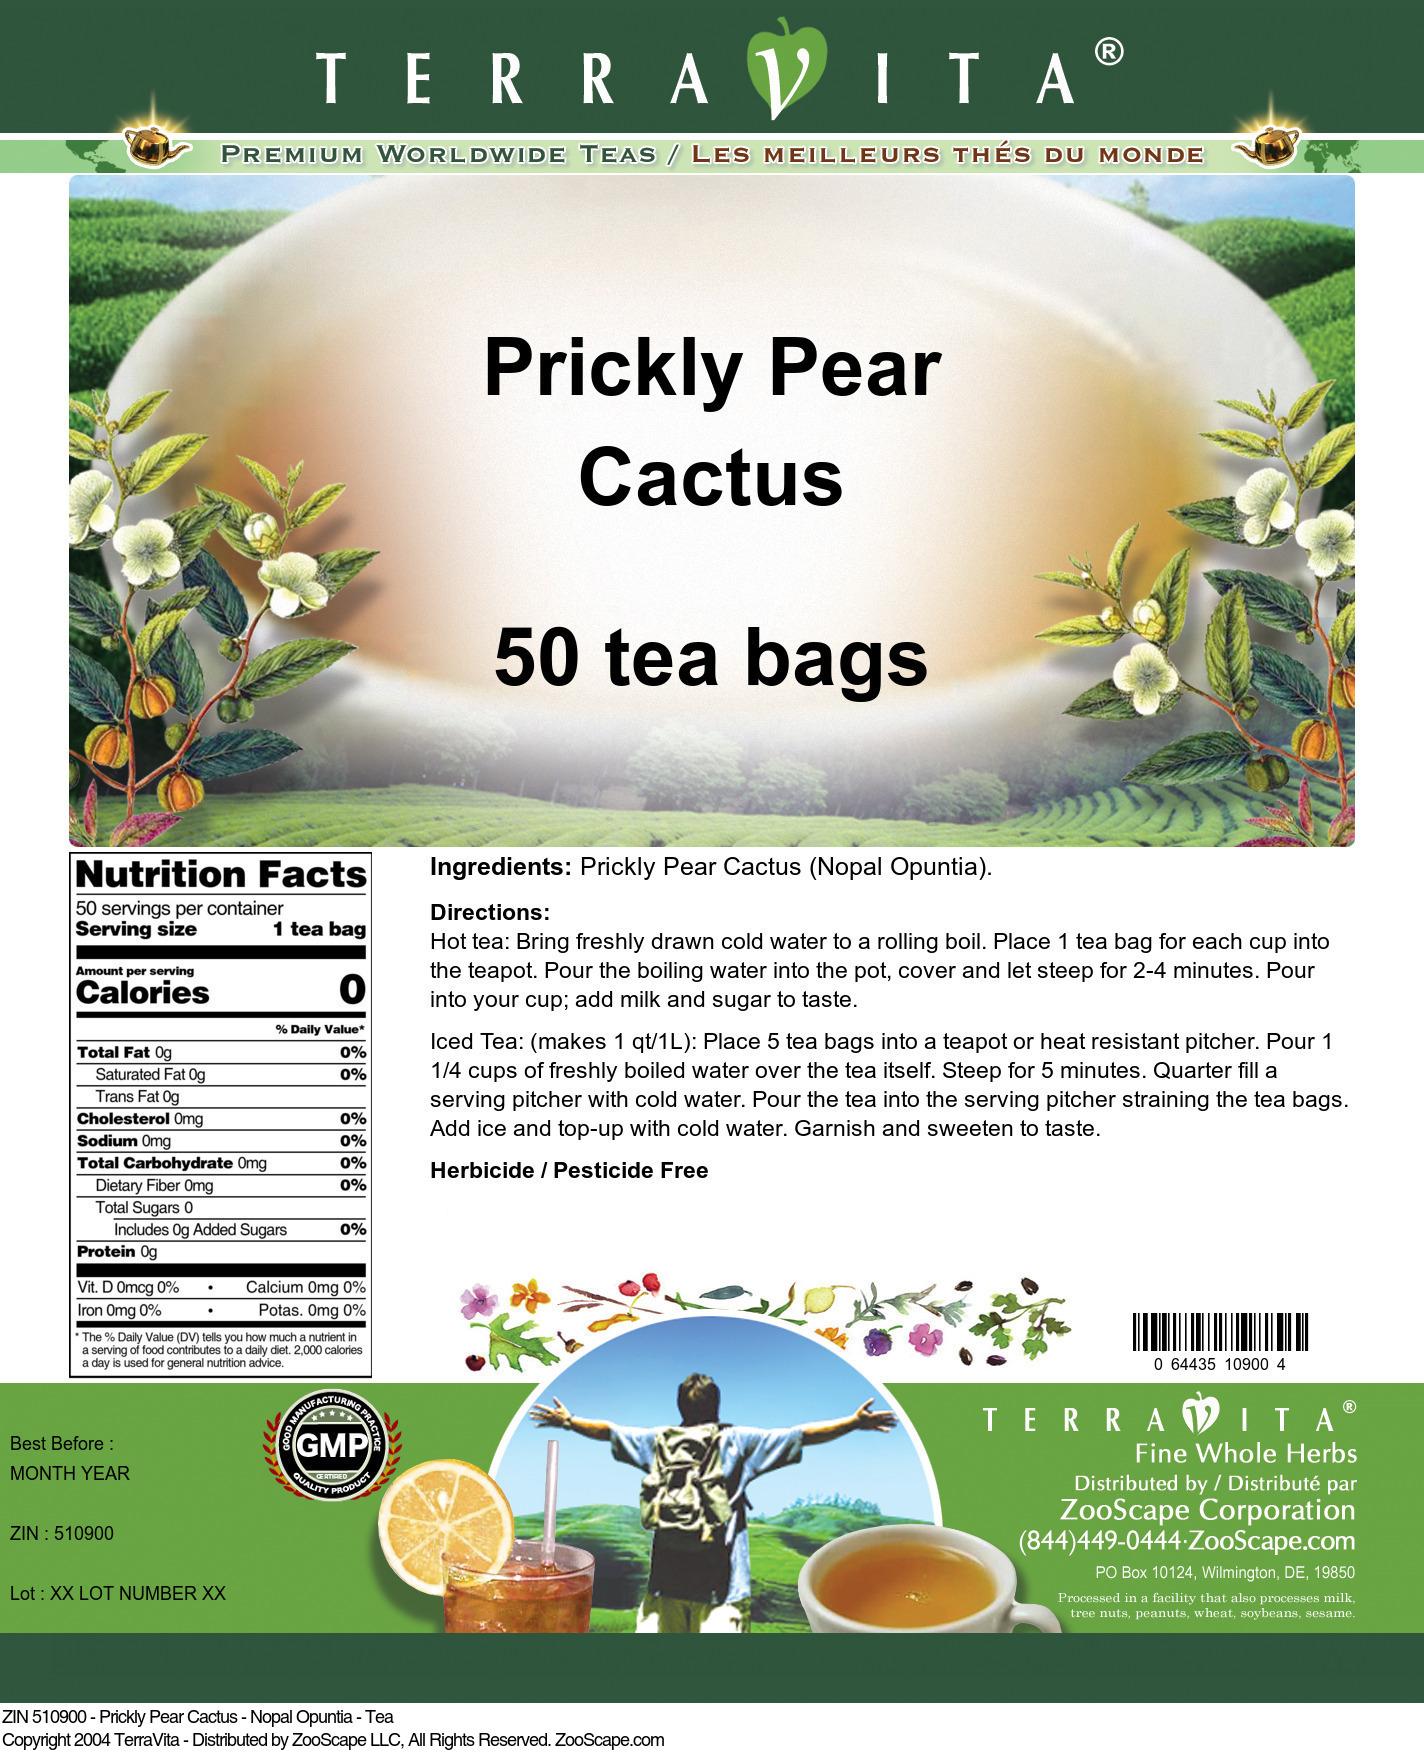 Prickly Pear Cactus - Nopal Opuntia - Tea